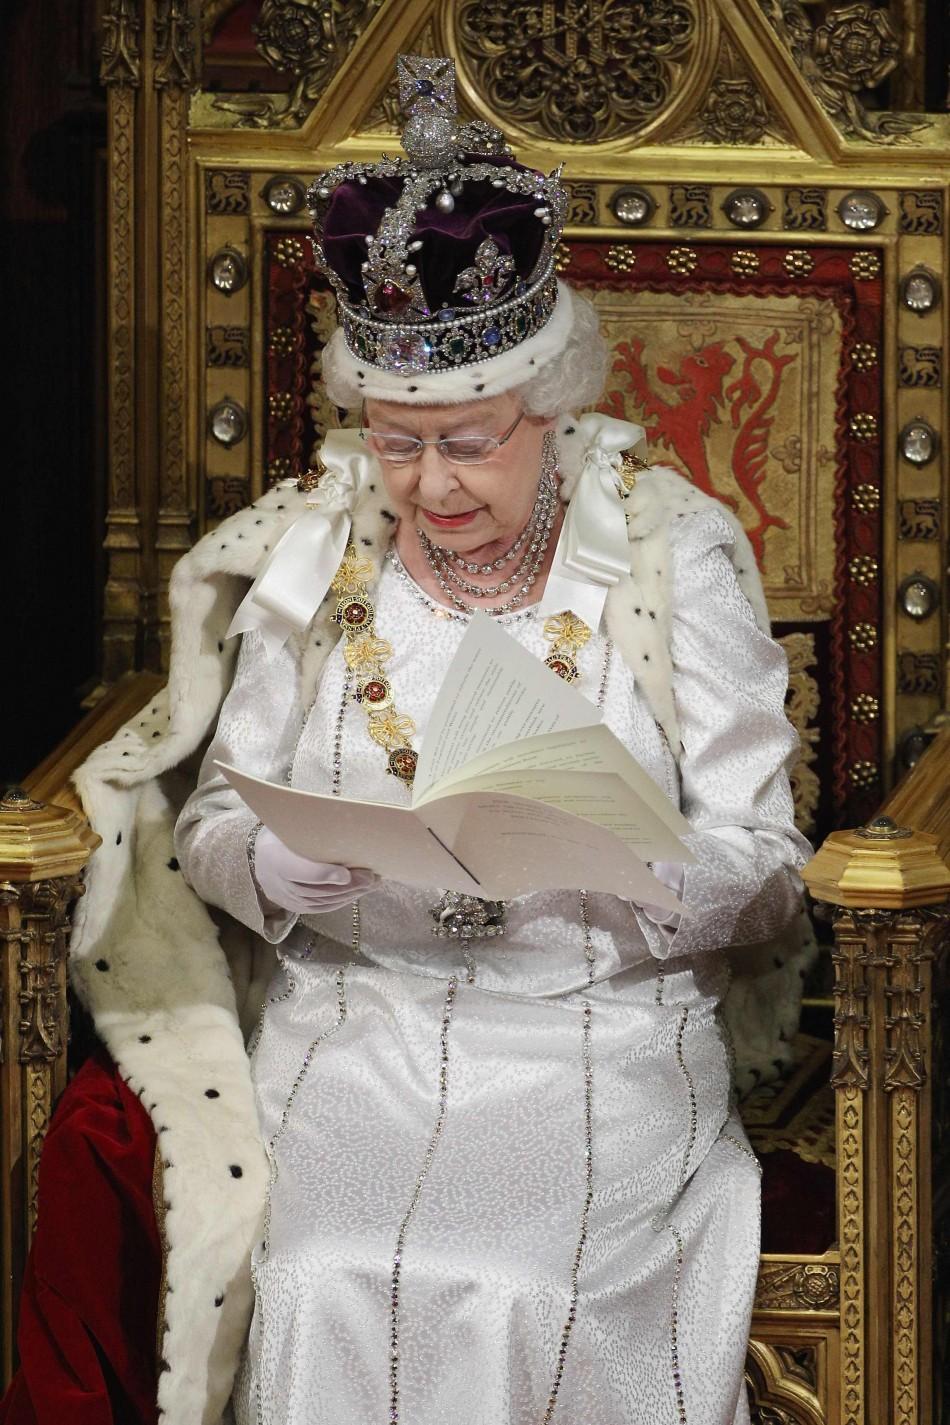 De Beers, Valentino and Other Designers Celebrate Queens Diamond Jubilee at Harrods